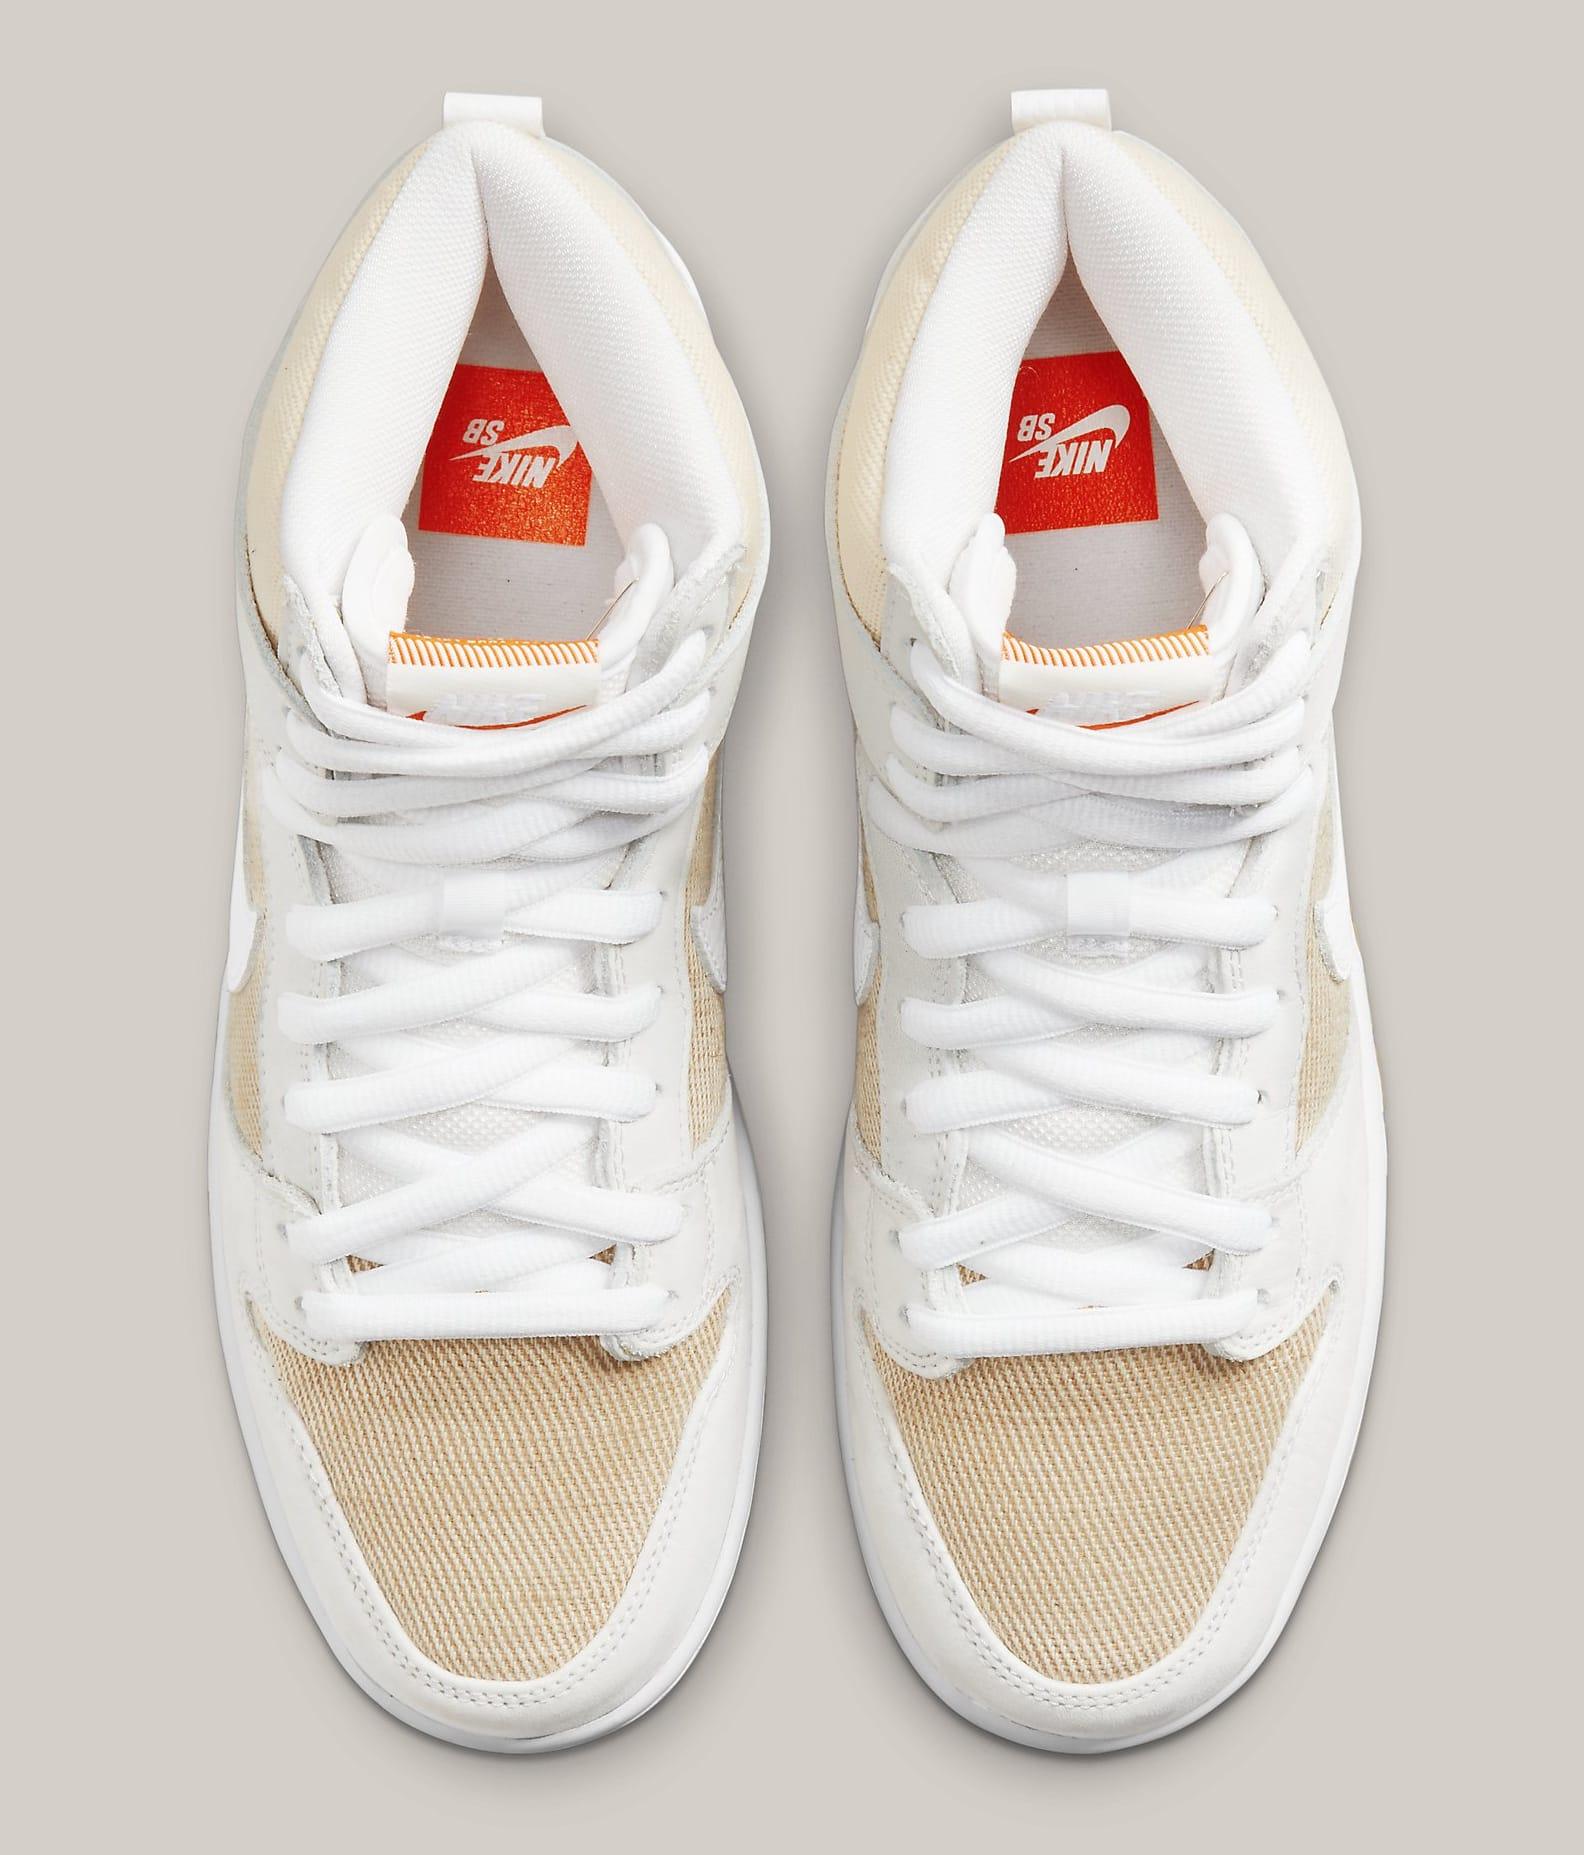 Nike SB Dunk High 'Unbleached' DA9626-100 Top